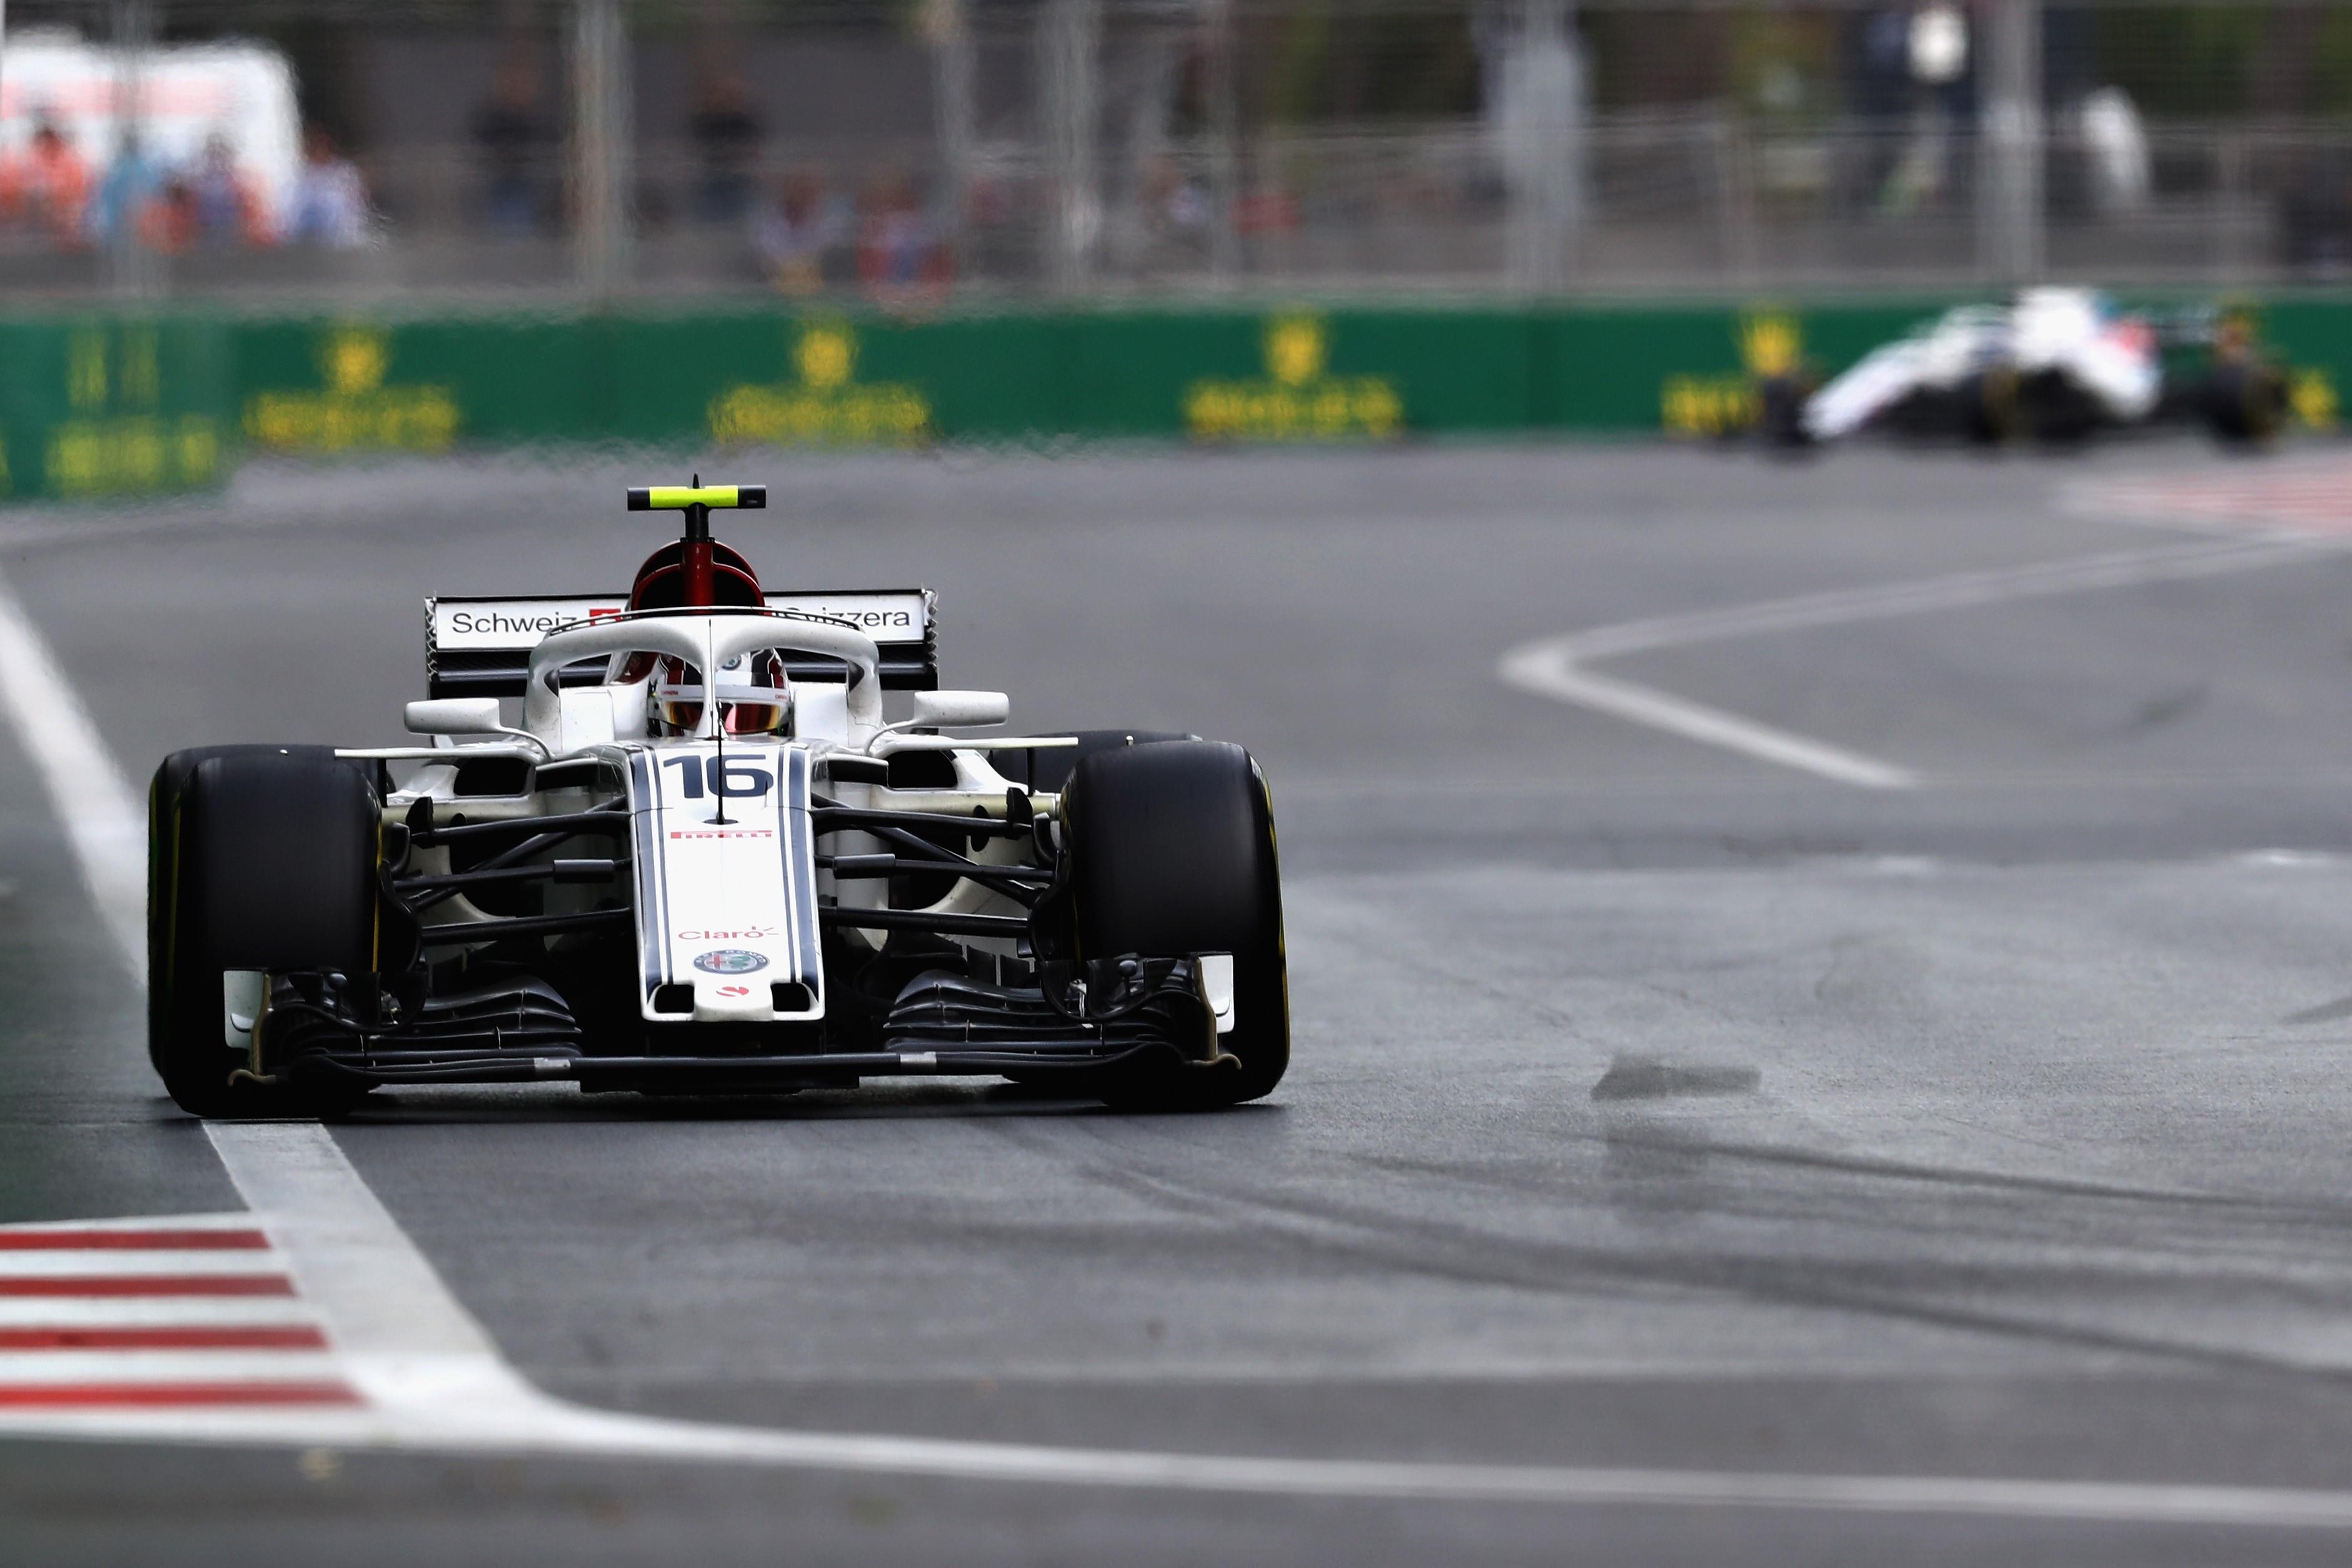 Charles Leclerc (Sauber) au Grand Prix d'Azerbaïdjan 2018